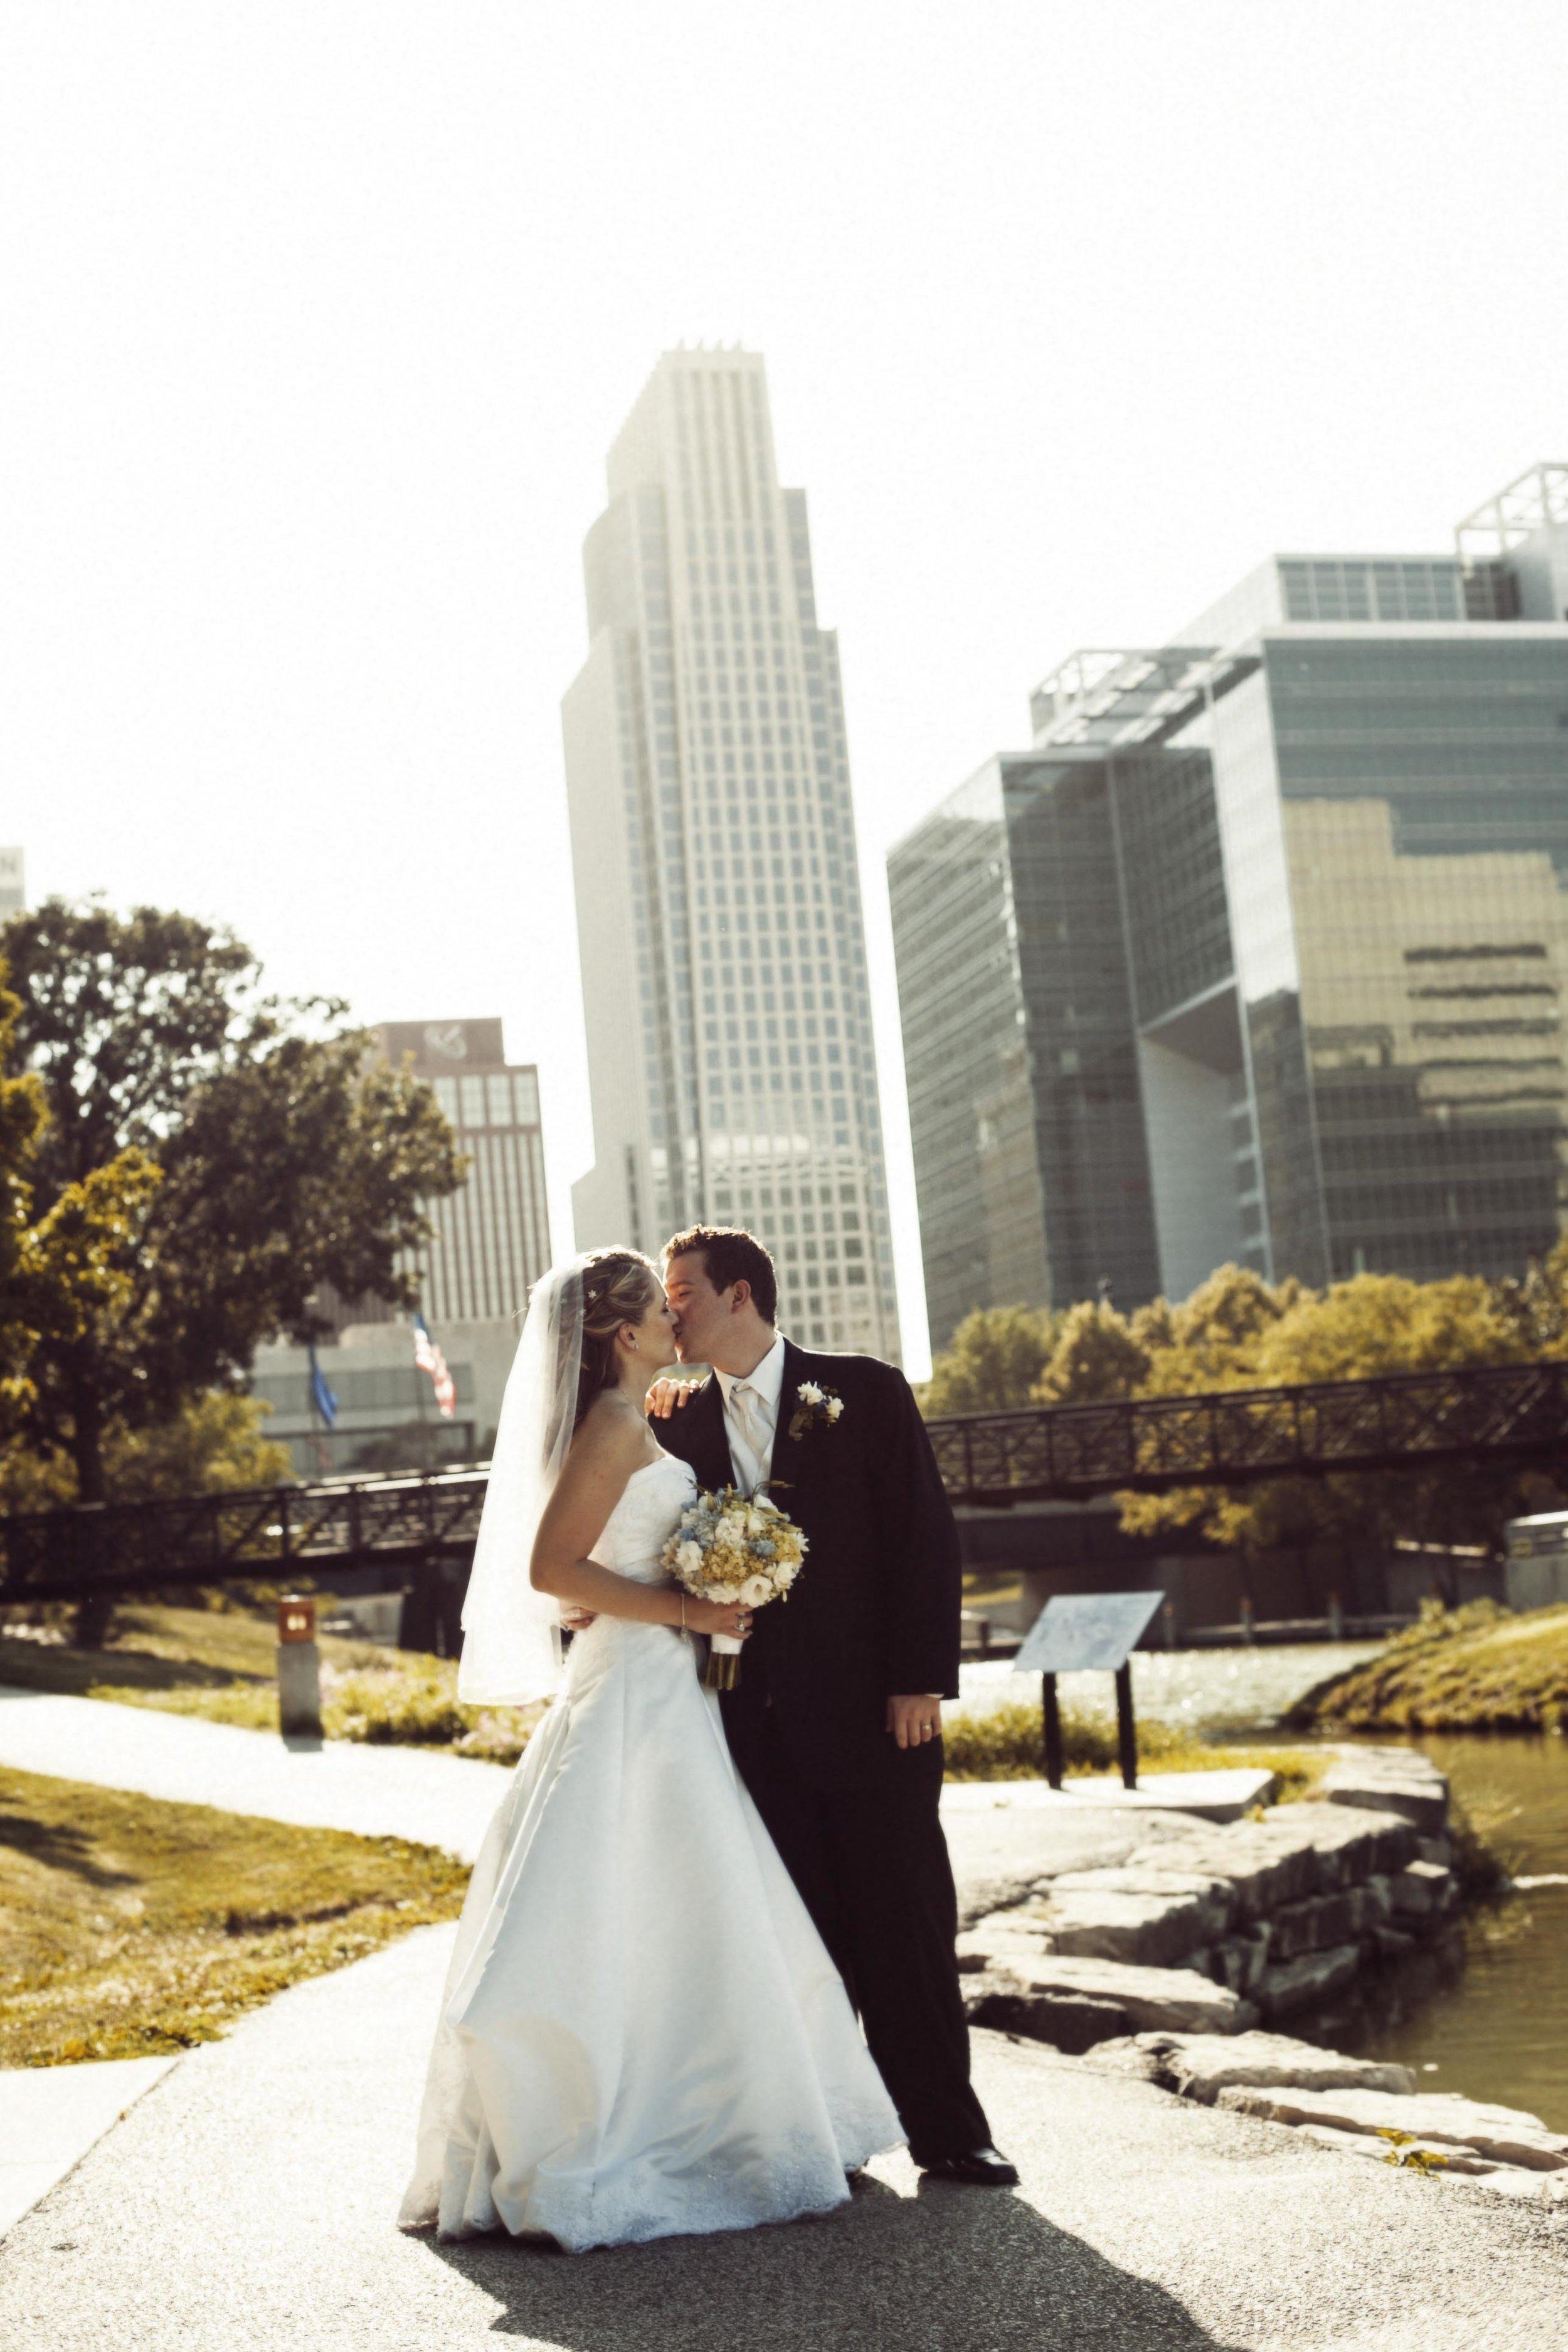 Katie + Joe - downtown omaha wedding photos